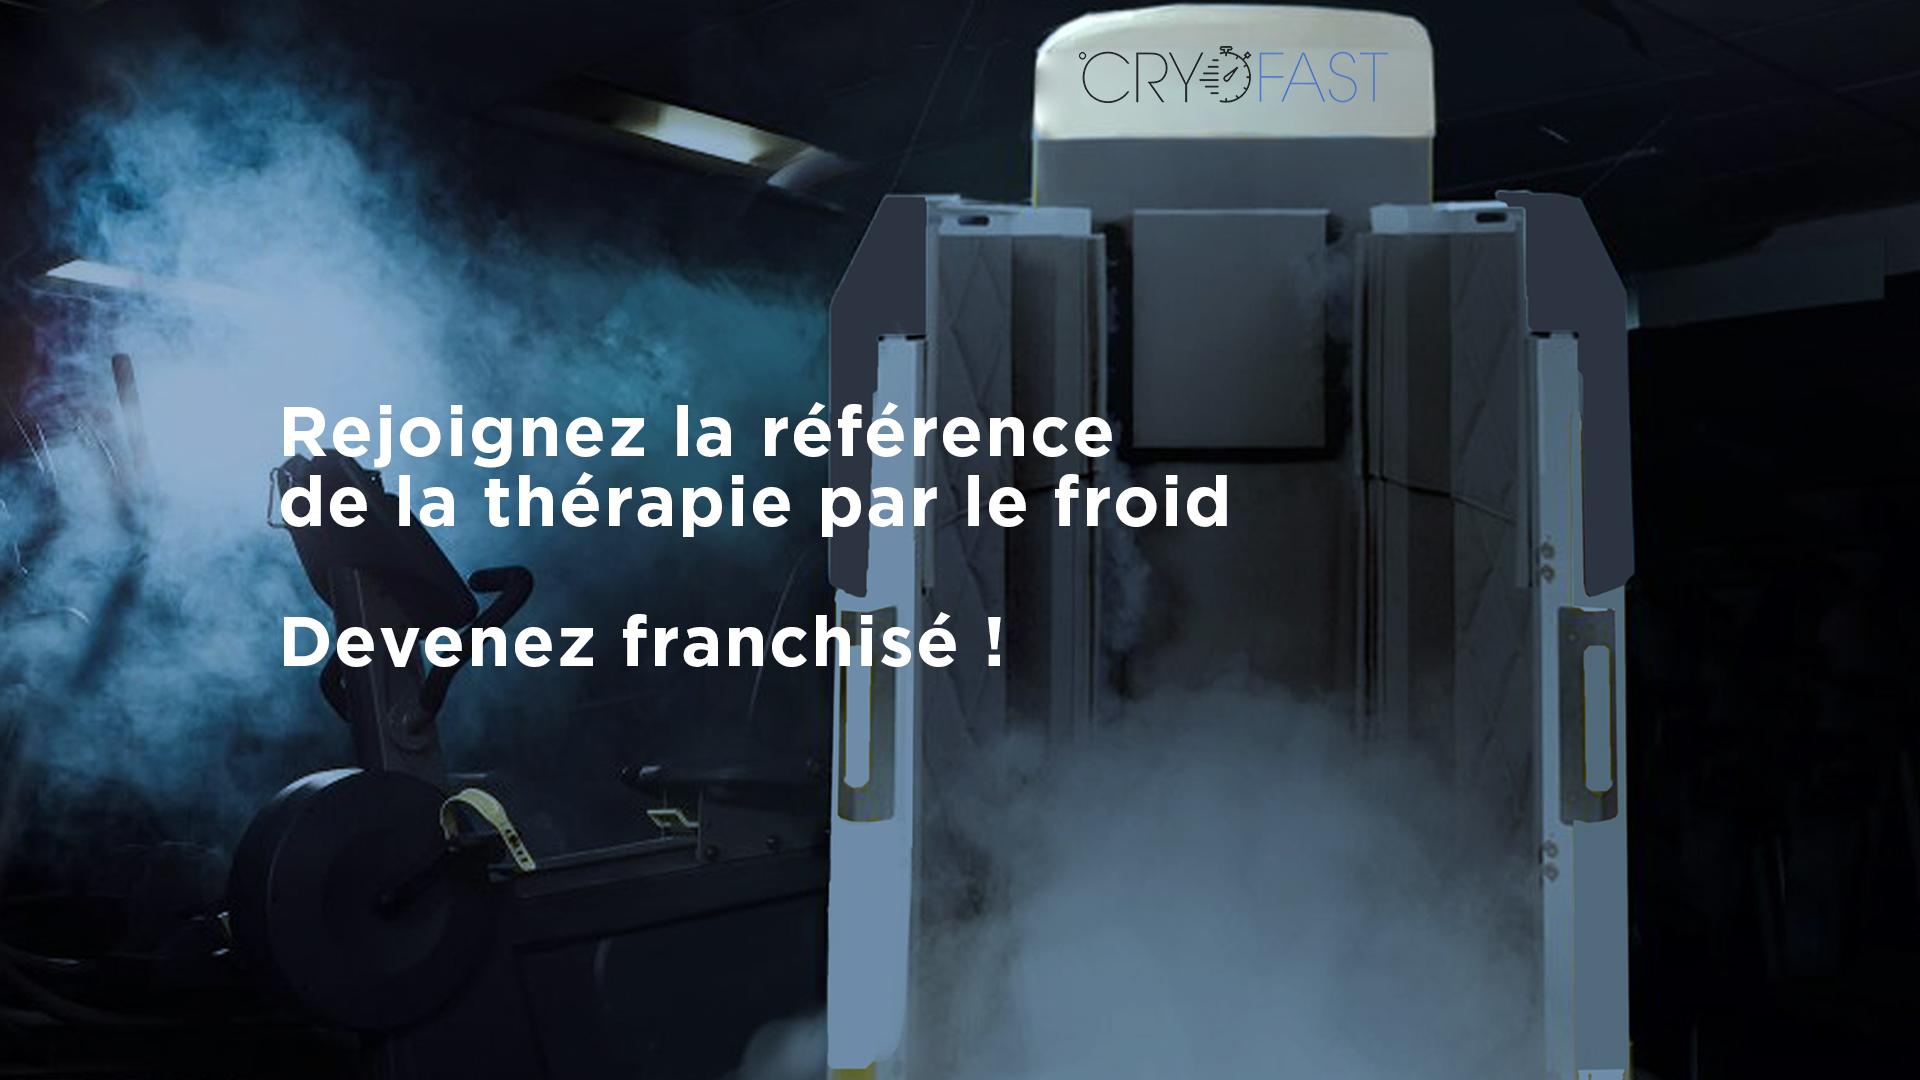 Cryosauna de cryothérapie Cryofast ouvert dans une salle de sport